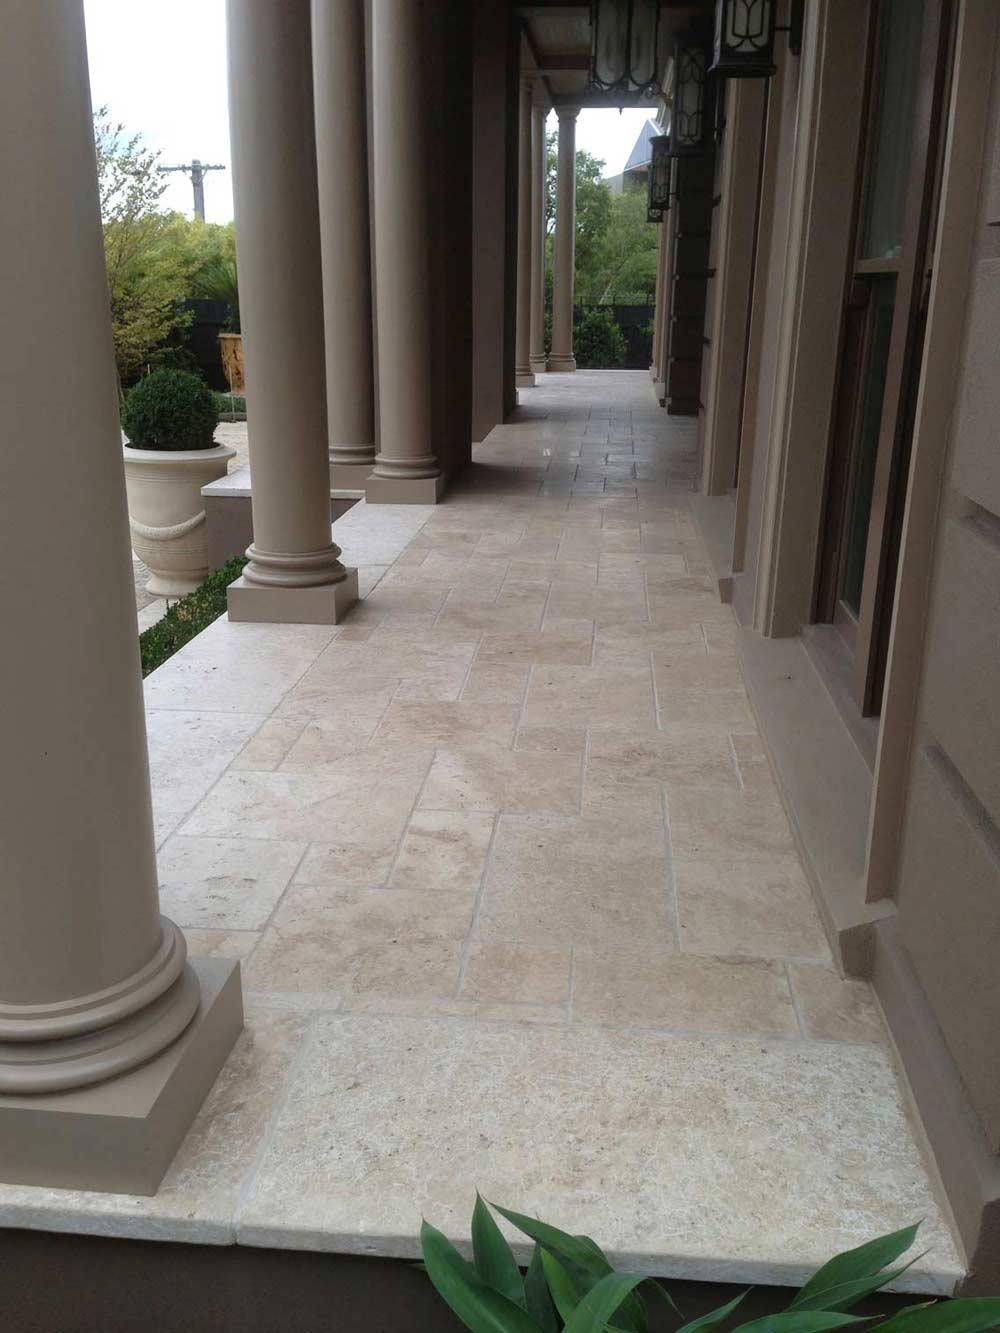 stone tiles with stone pillars